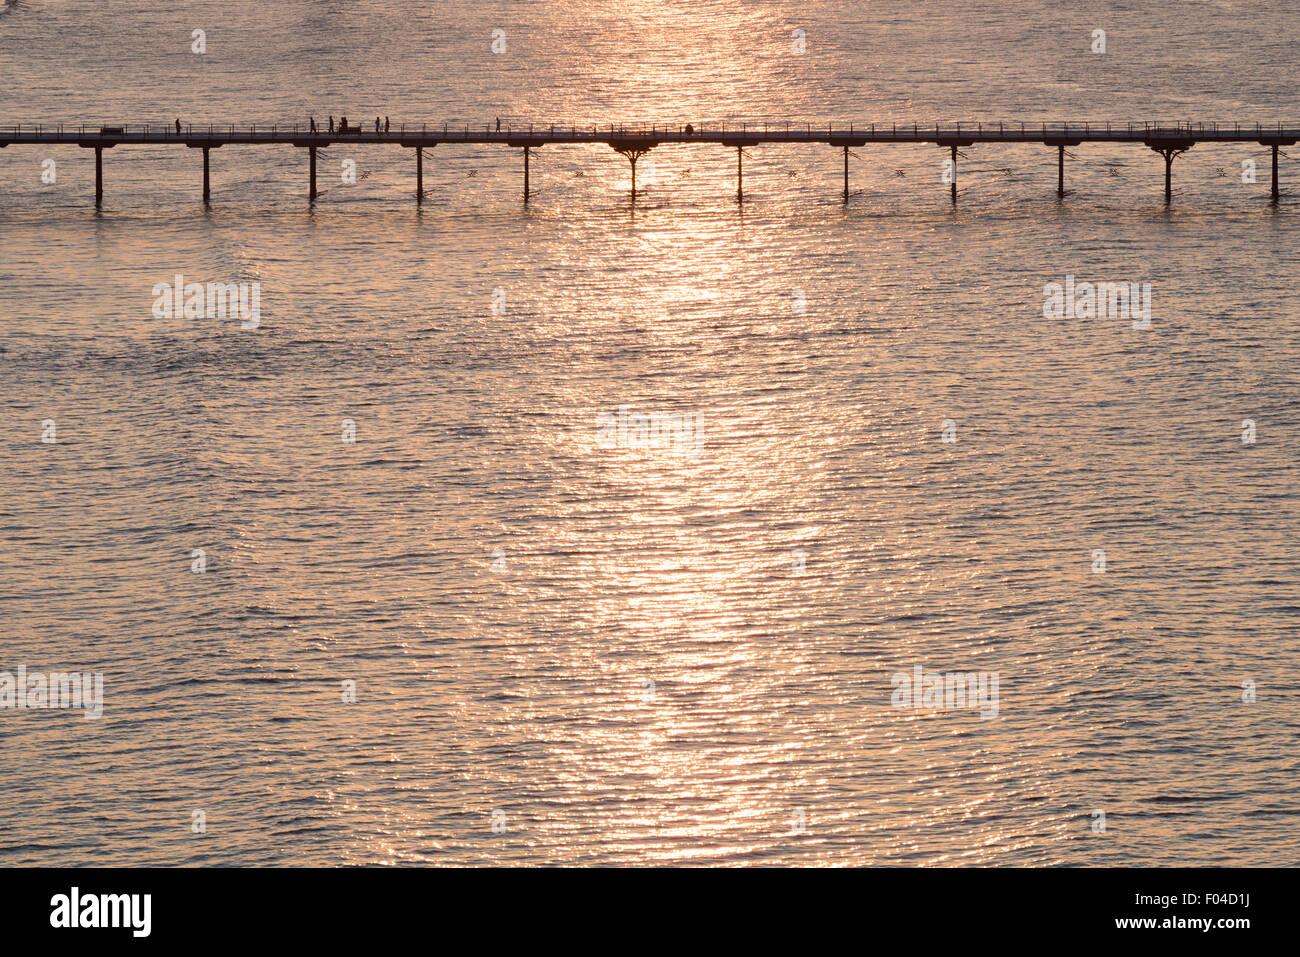 Sonnenuntergang über Saltburn Pier, North Yorkshire. Stockfoto